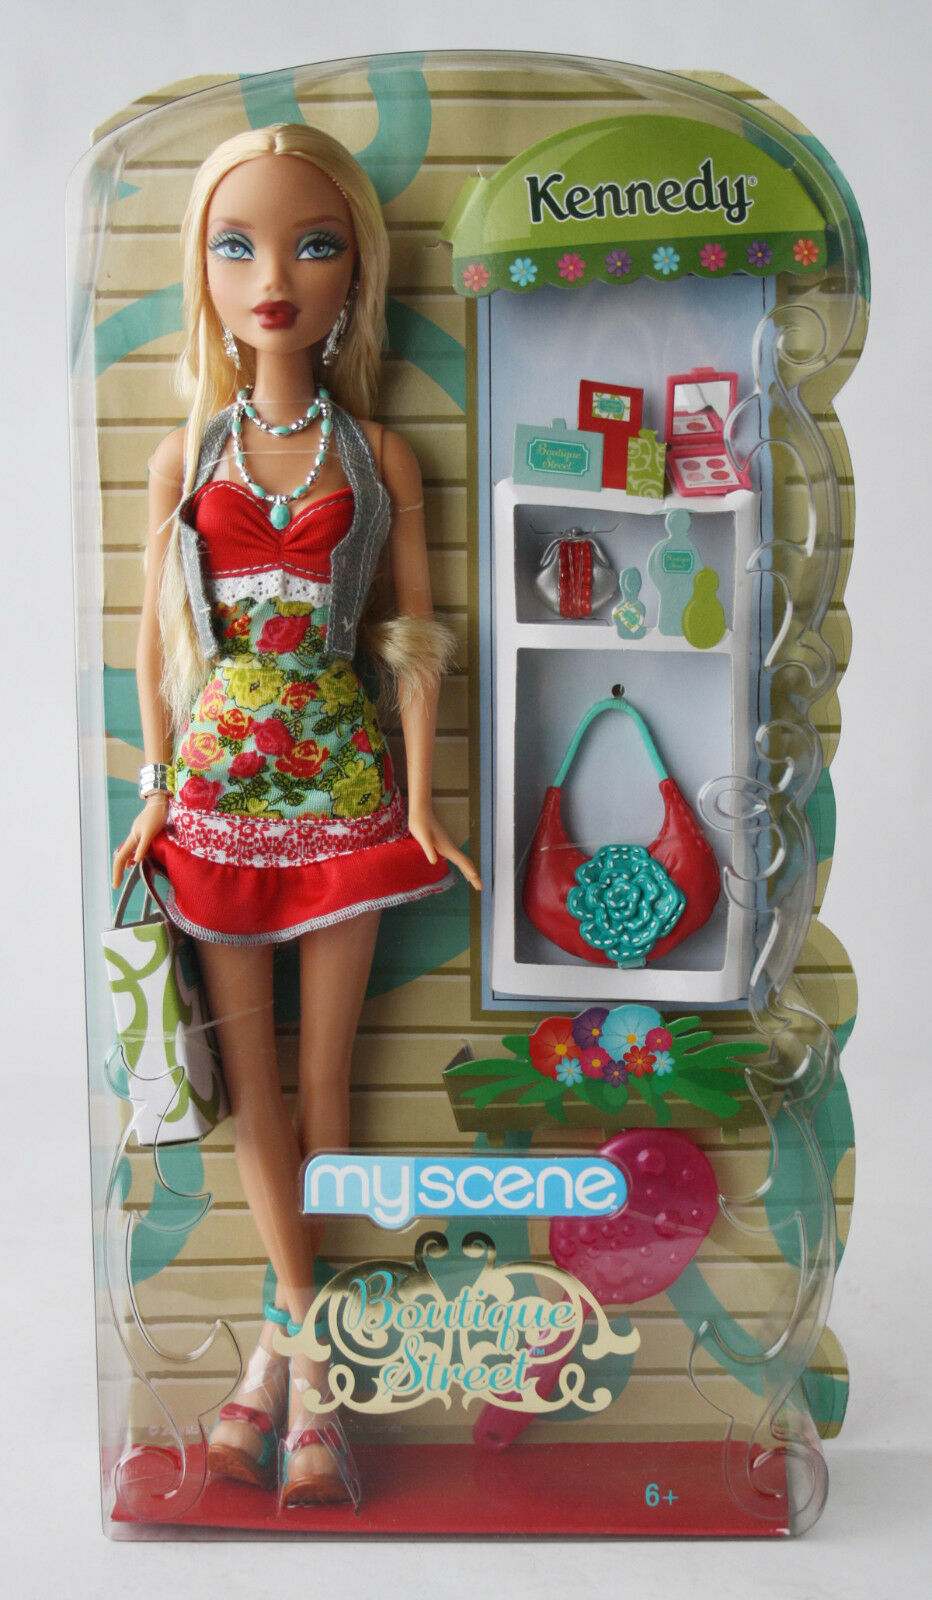 Raro 2008 My Scene Kennedy Boutique Street Muñeca Barbie Mattel Nuevo Sellado